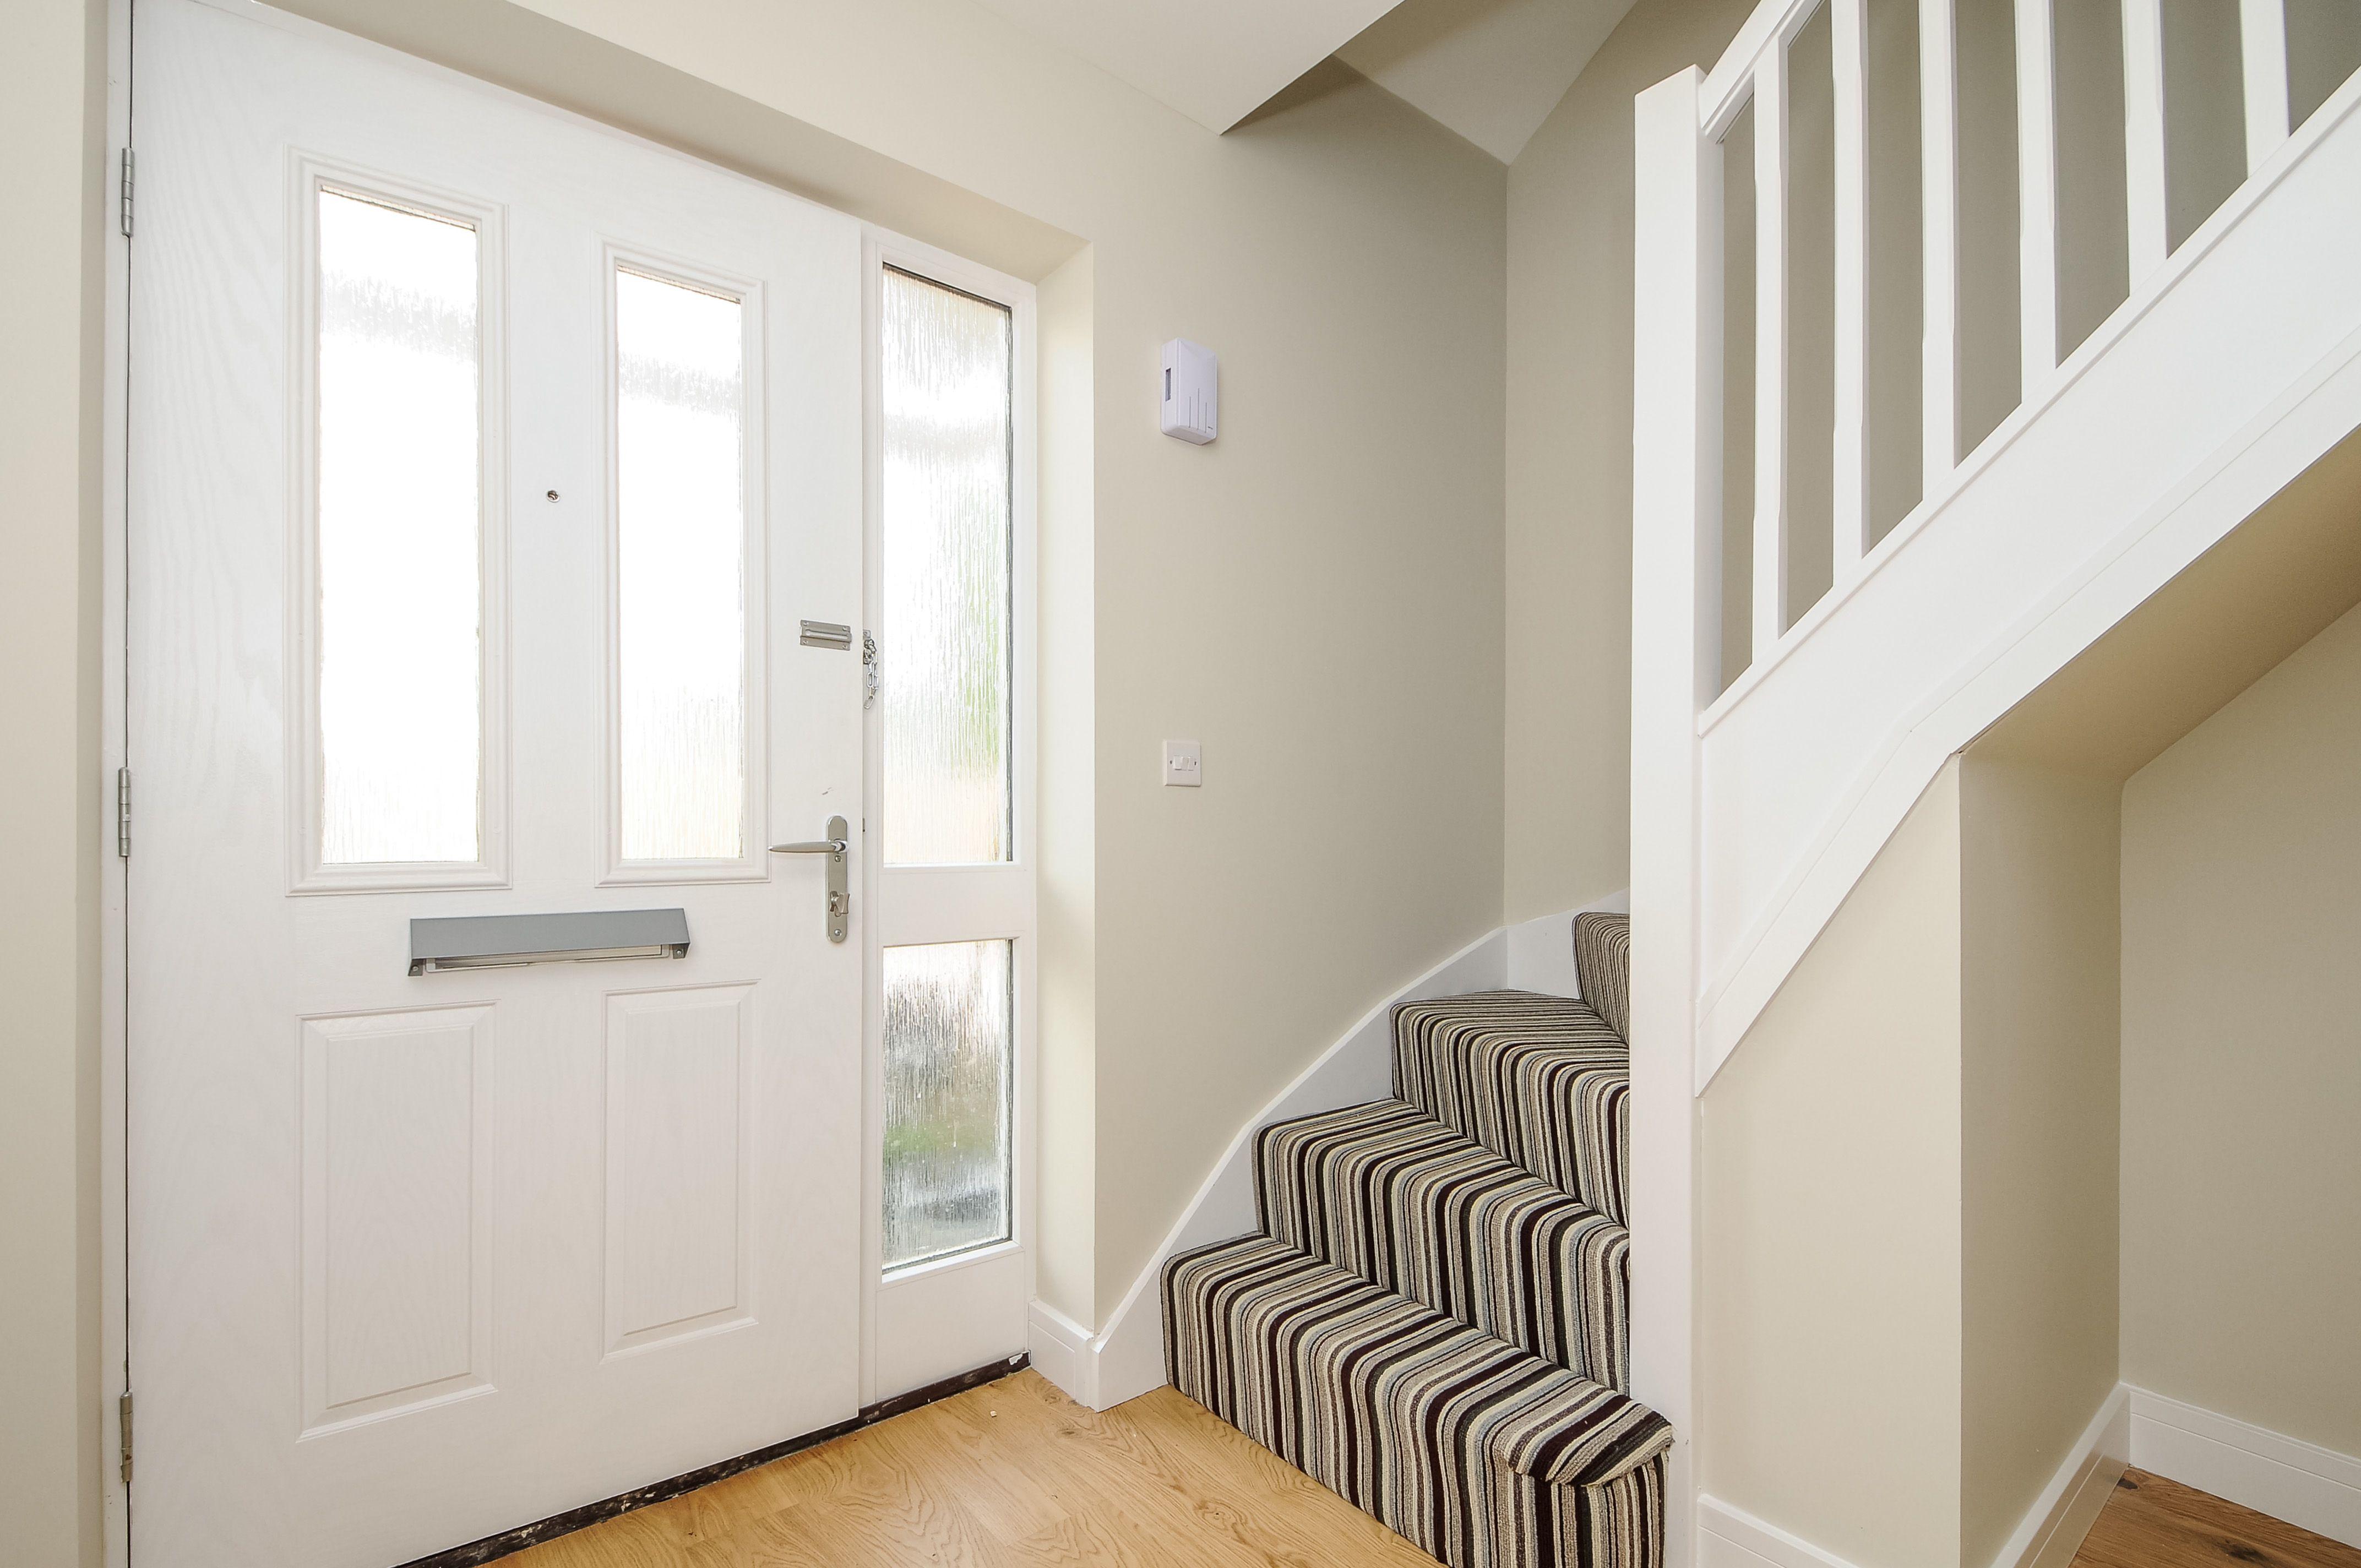 best 25 dulux satinwood ideas on pinterest dulux floor. Black Bedroom Furniture Sets. Home Design Ideas